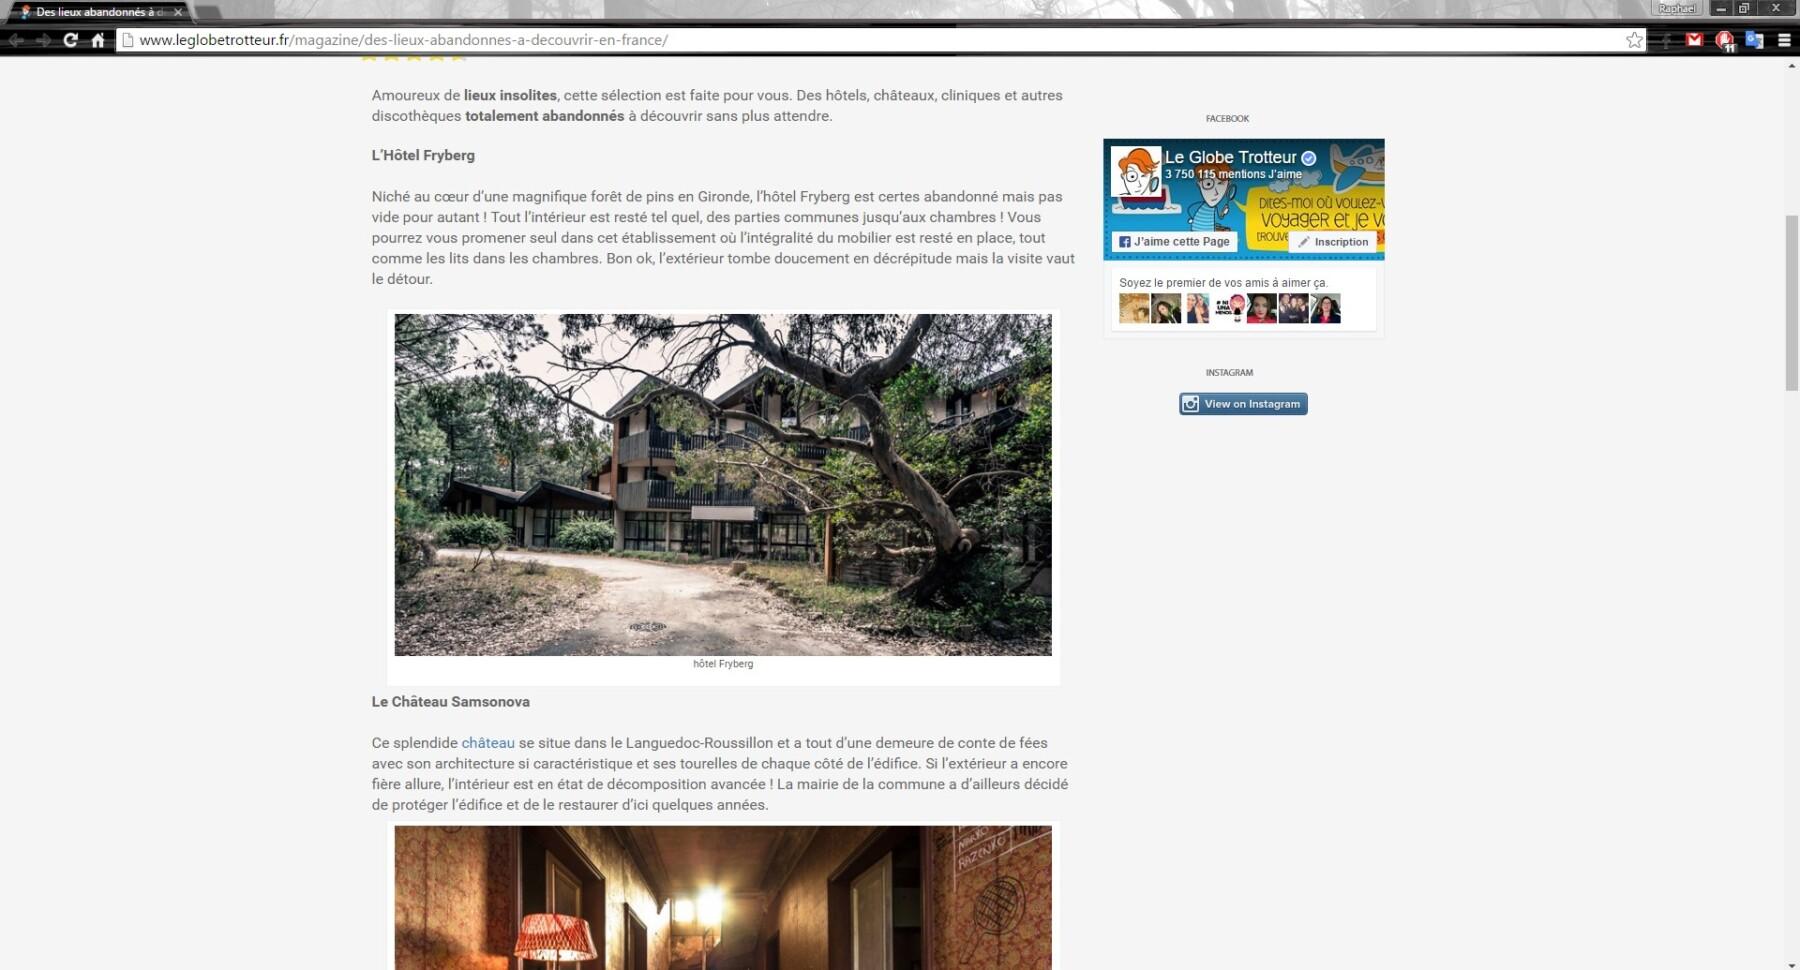 capture-ecran-site-article-xs-2-juin-2